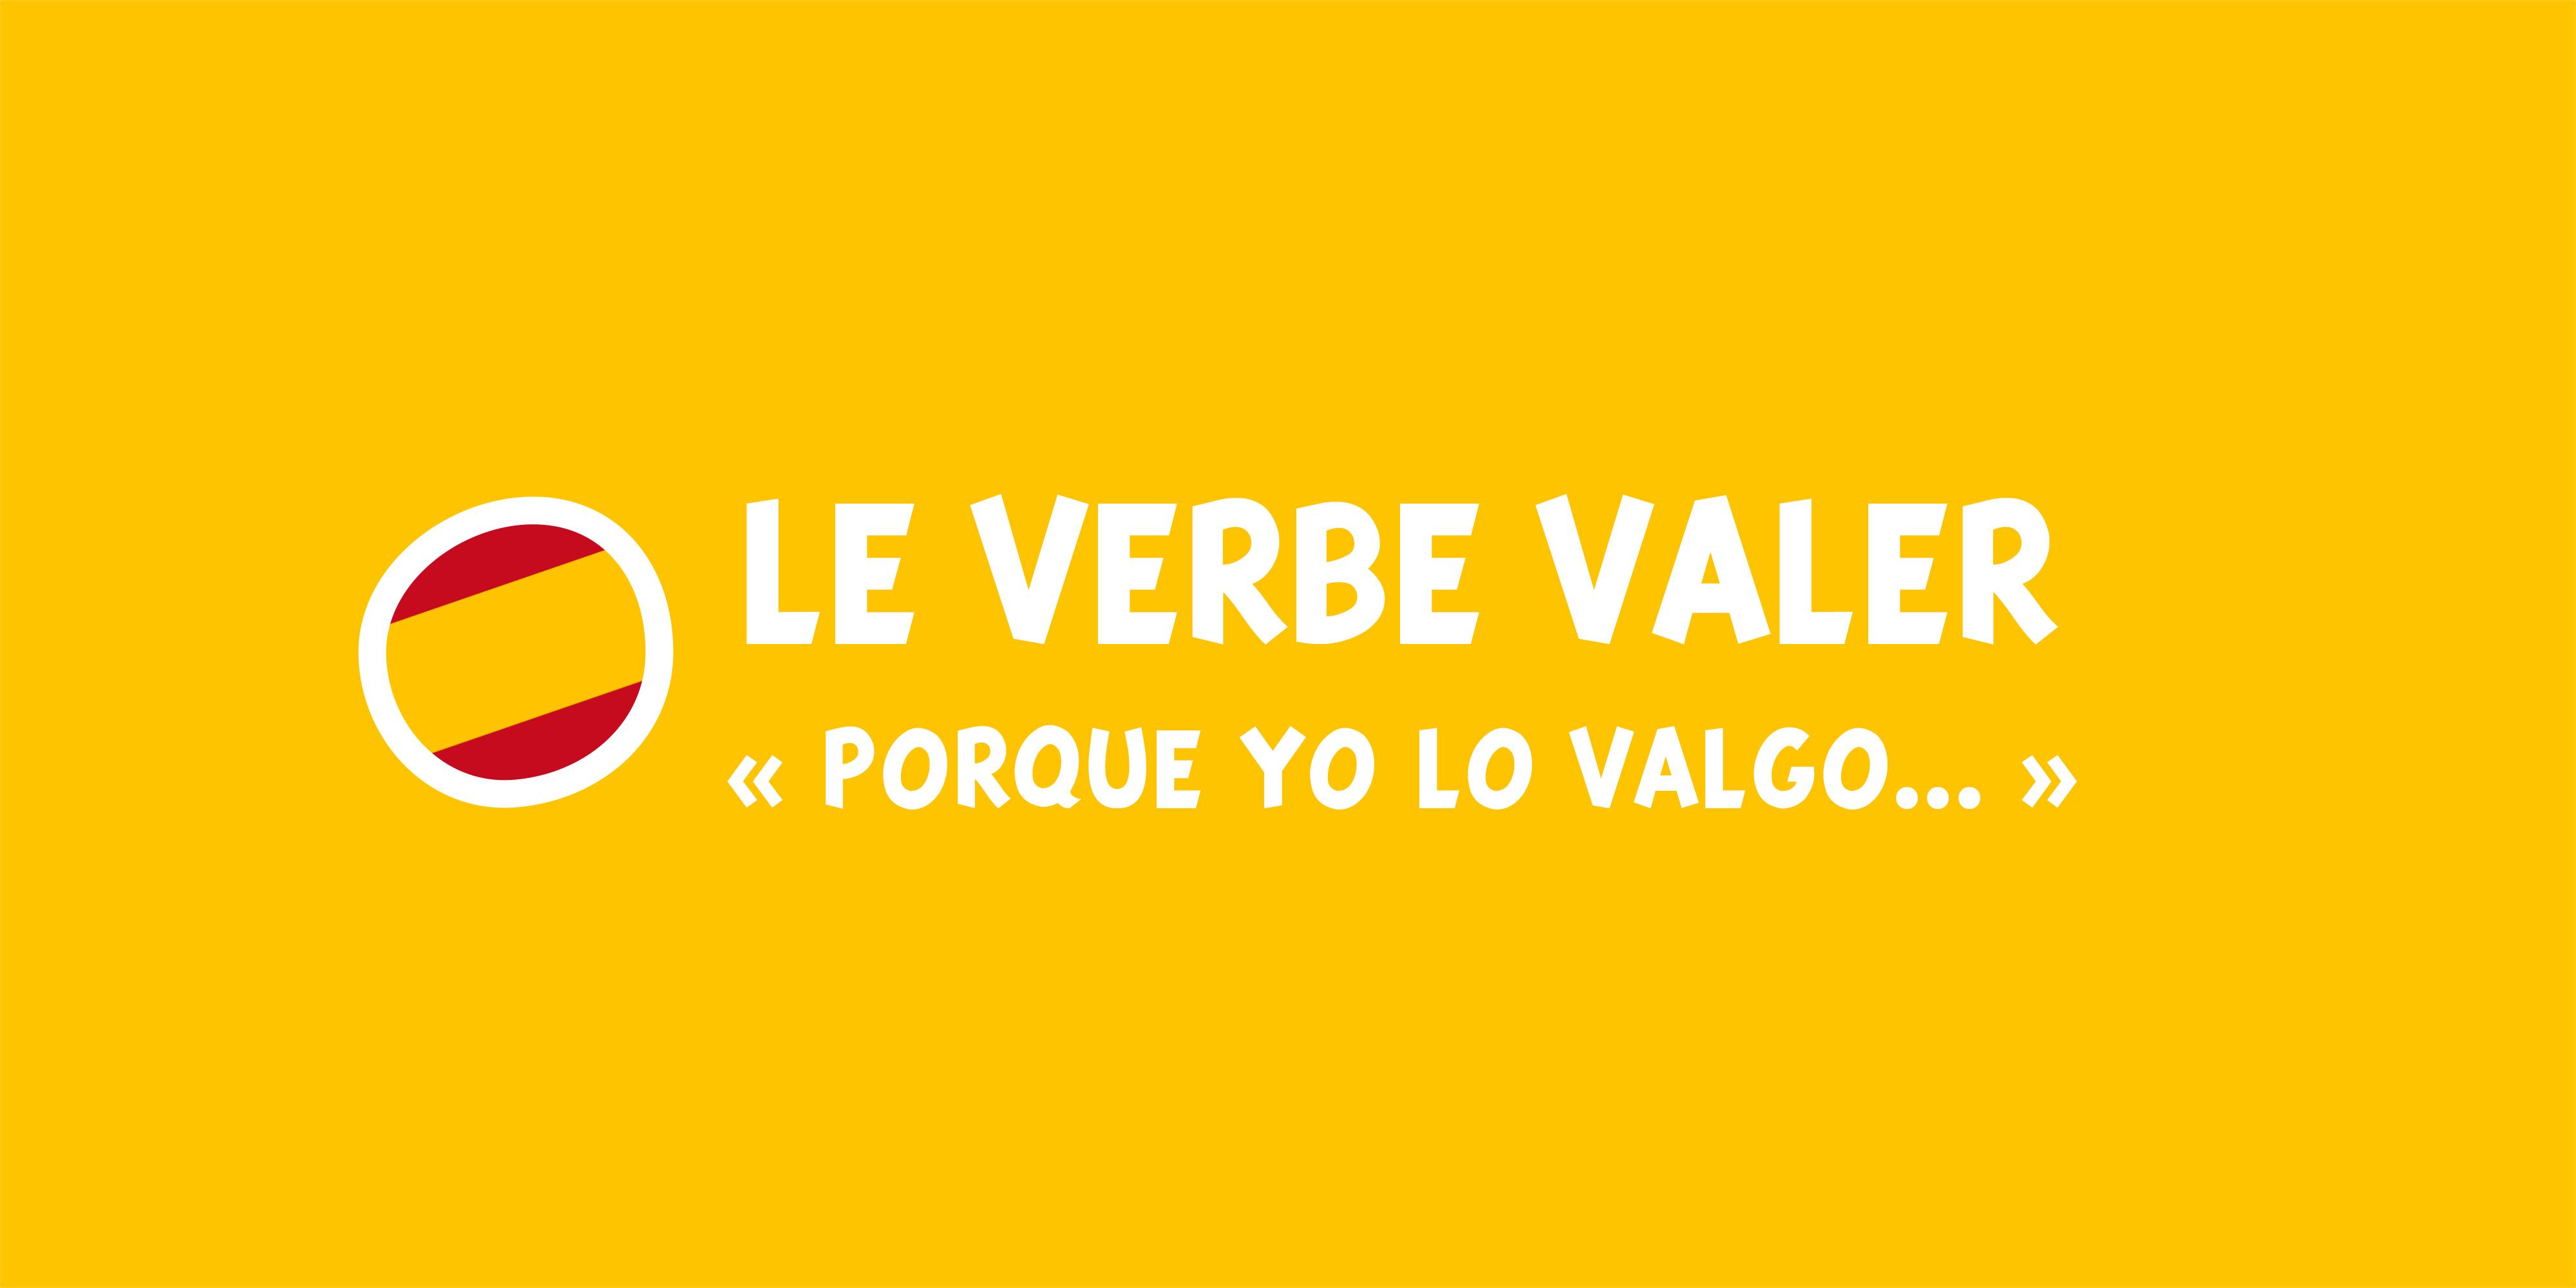 Les Utilisations Du Verbe Valer En Espagnol Et Quelques Expressions Telemartin Tv L Accent Sur L Espagnol